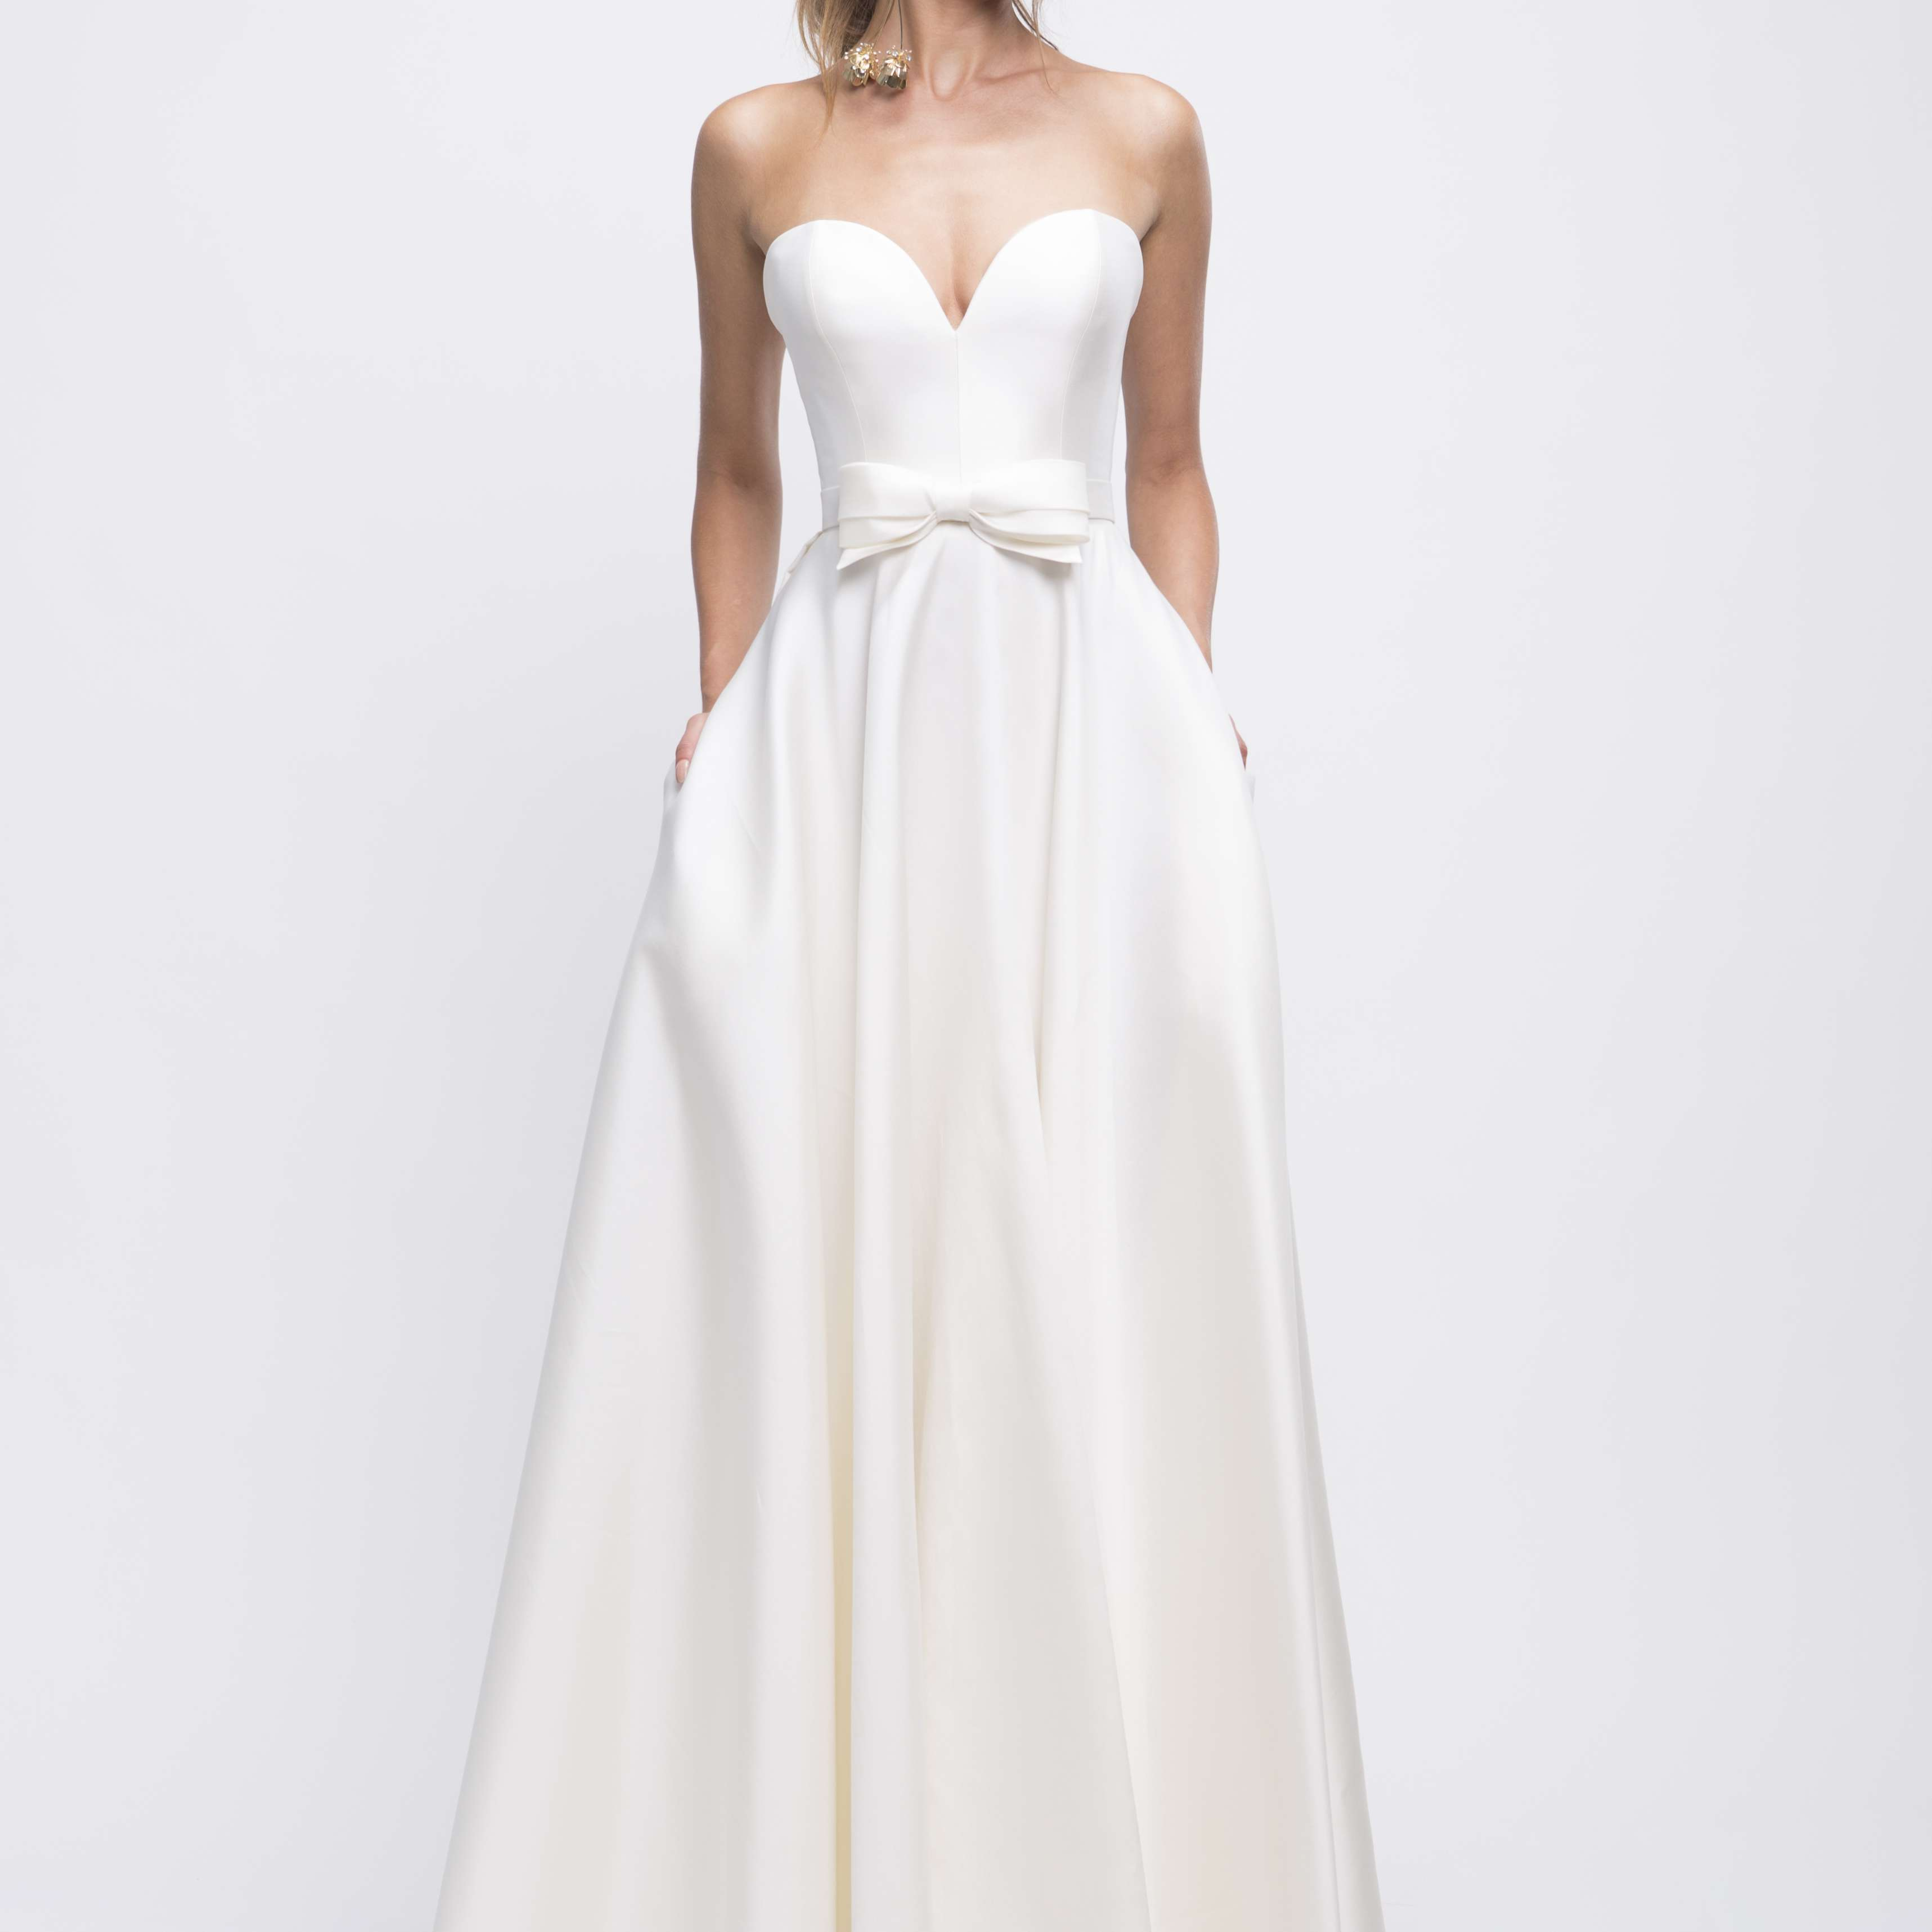 Audrey strapless wedding dress